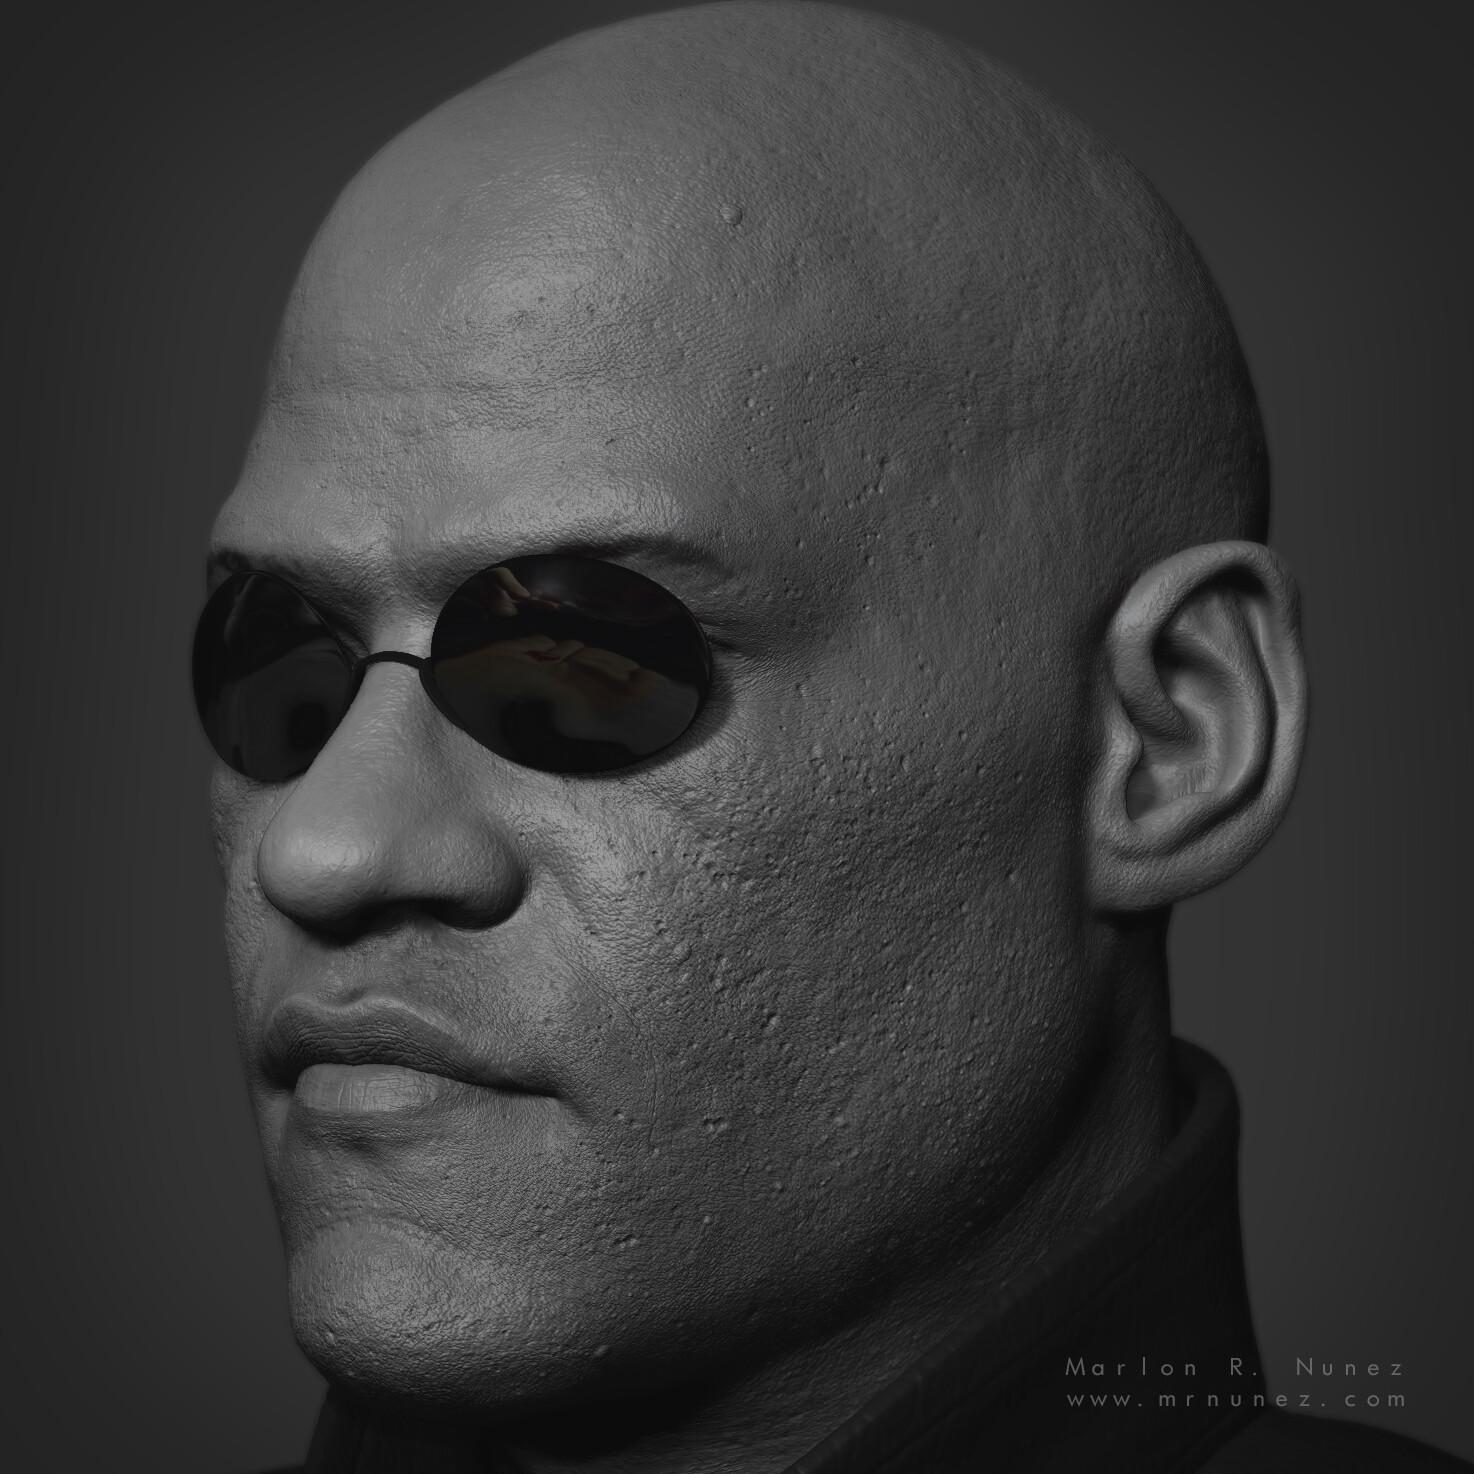 Marlon r nunez morpheus glasses2